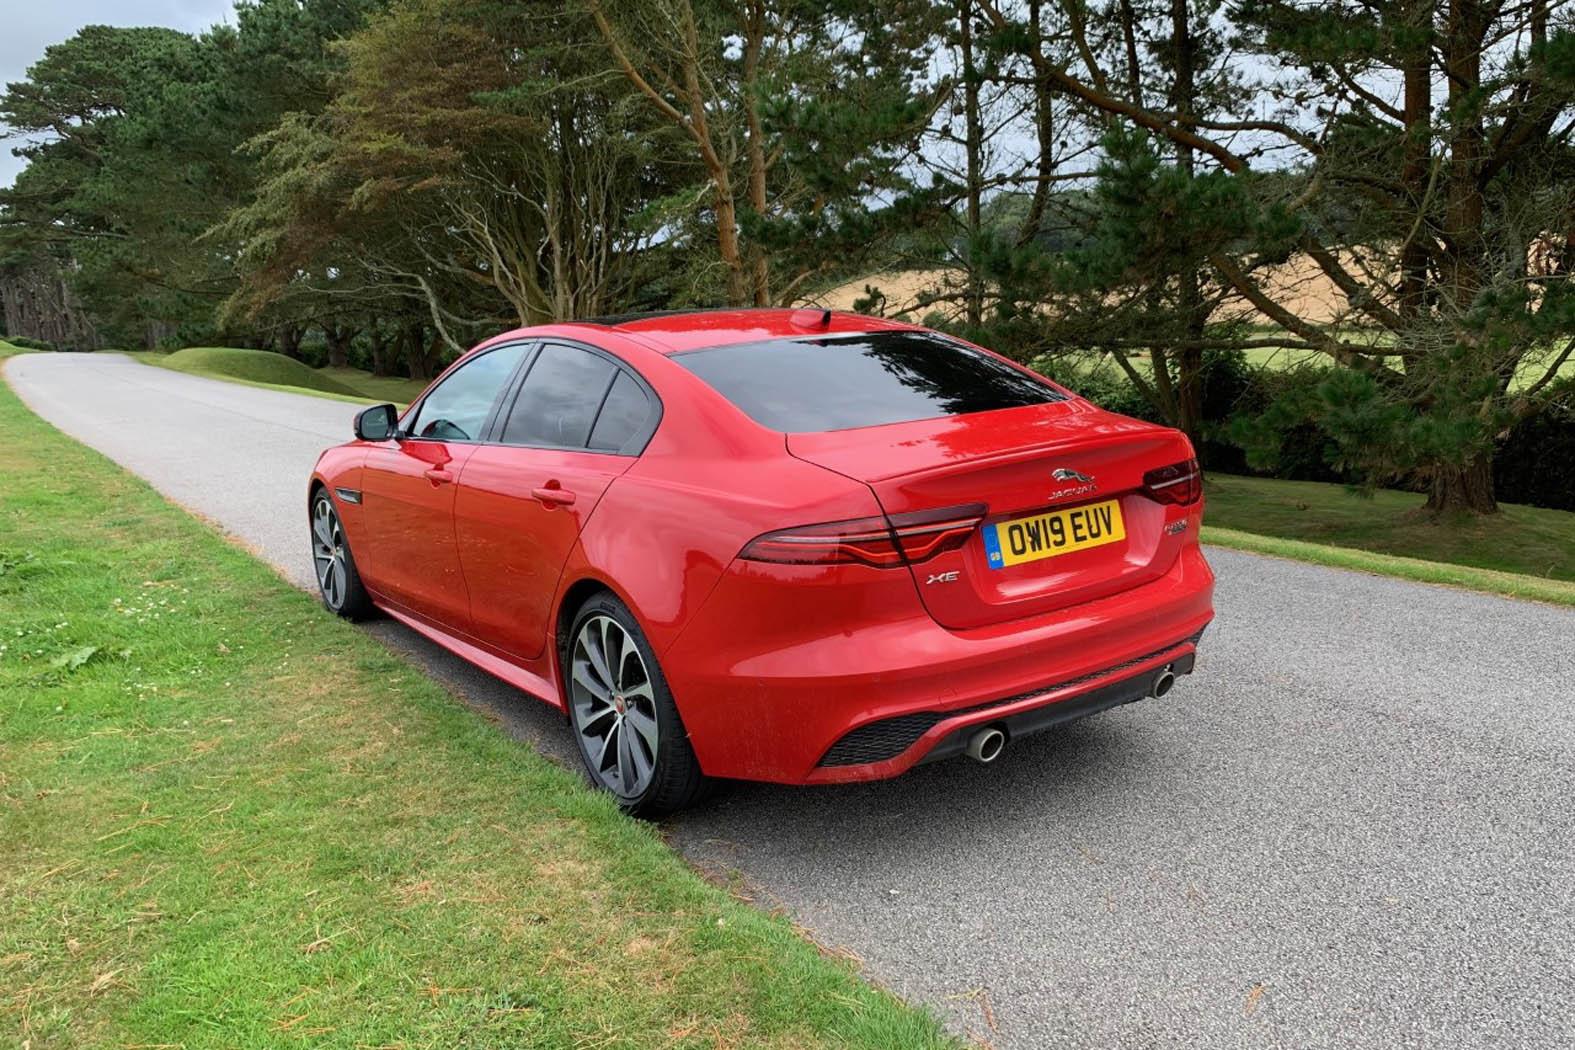 Jaguar XE HSE R-Dynamic 2.0 | Eurekar